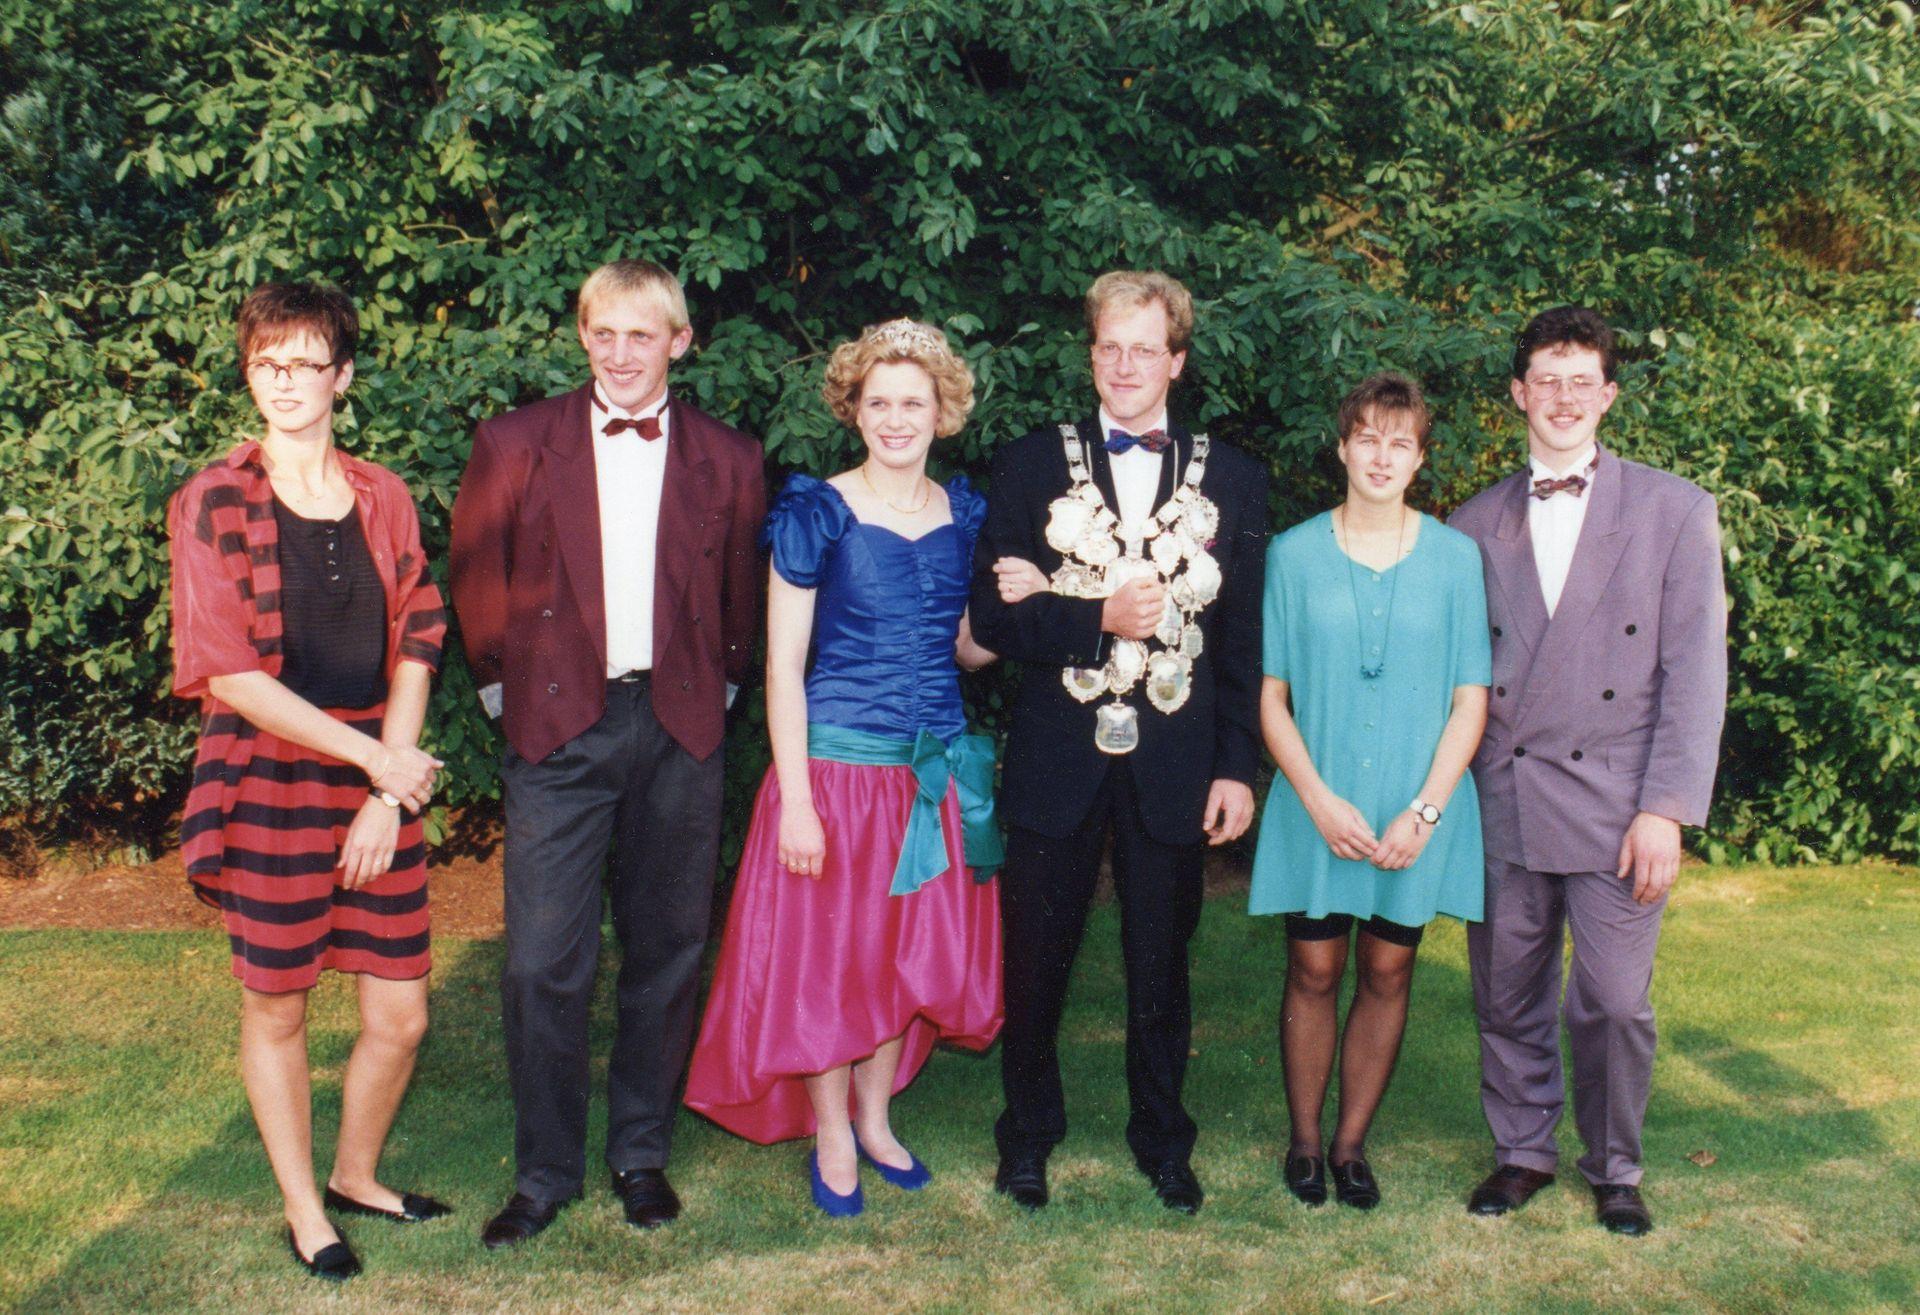 Königspaare 1991 - 2010